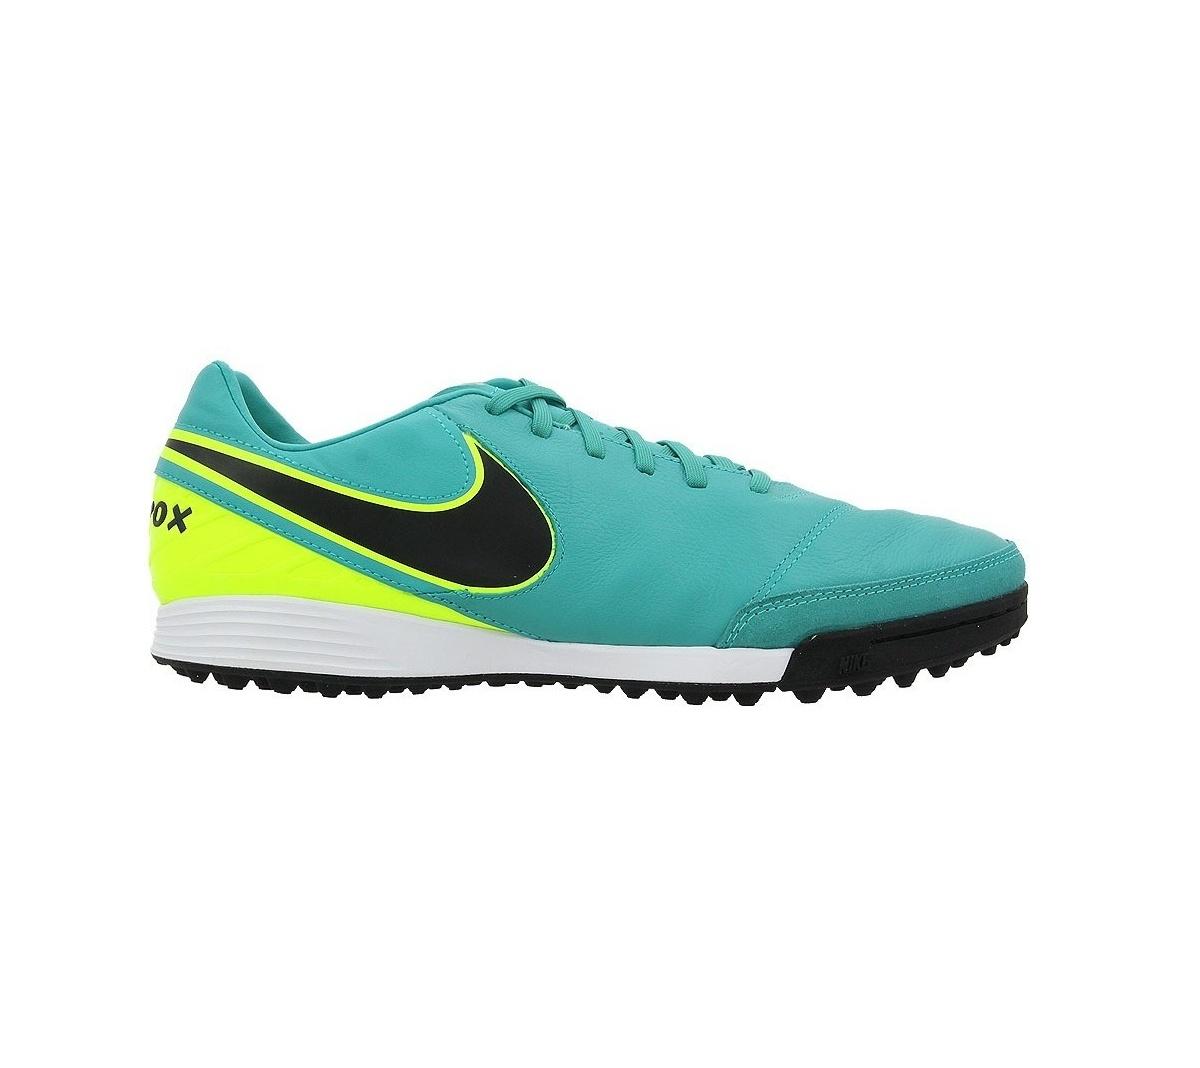 71685368cf Chuteira Nike Tiempo Mystic V Society Vd ...